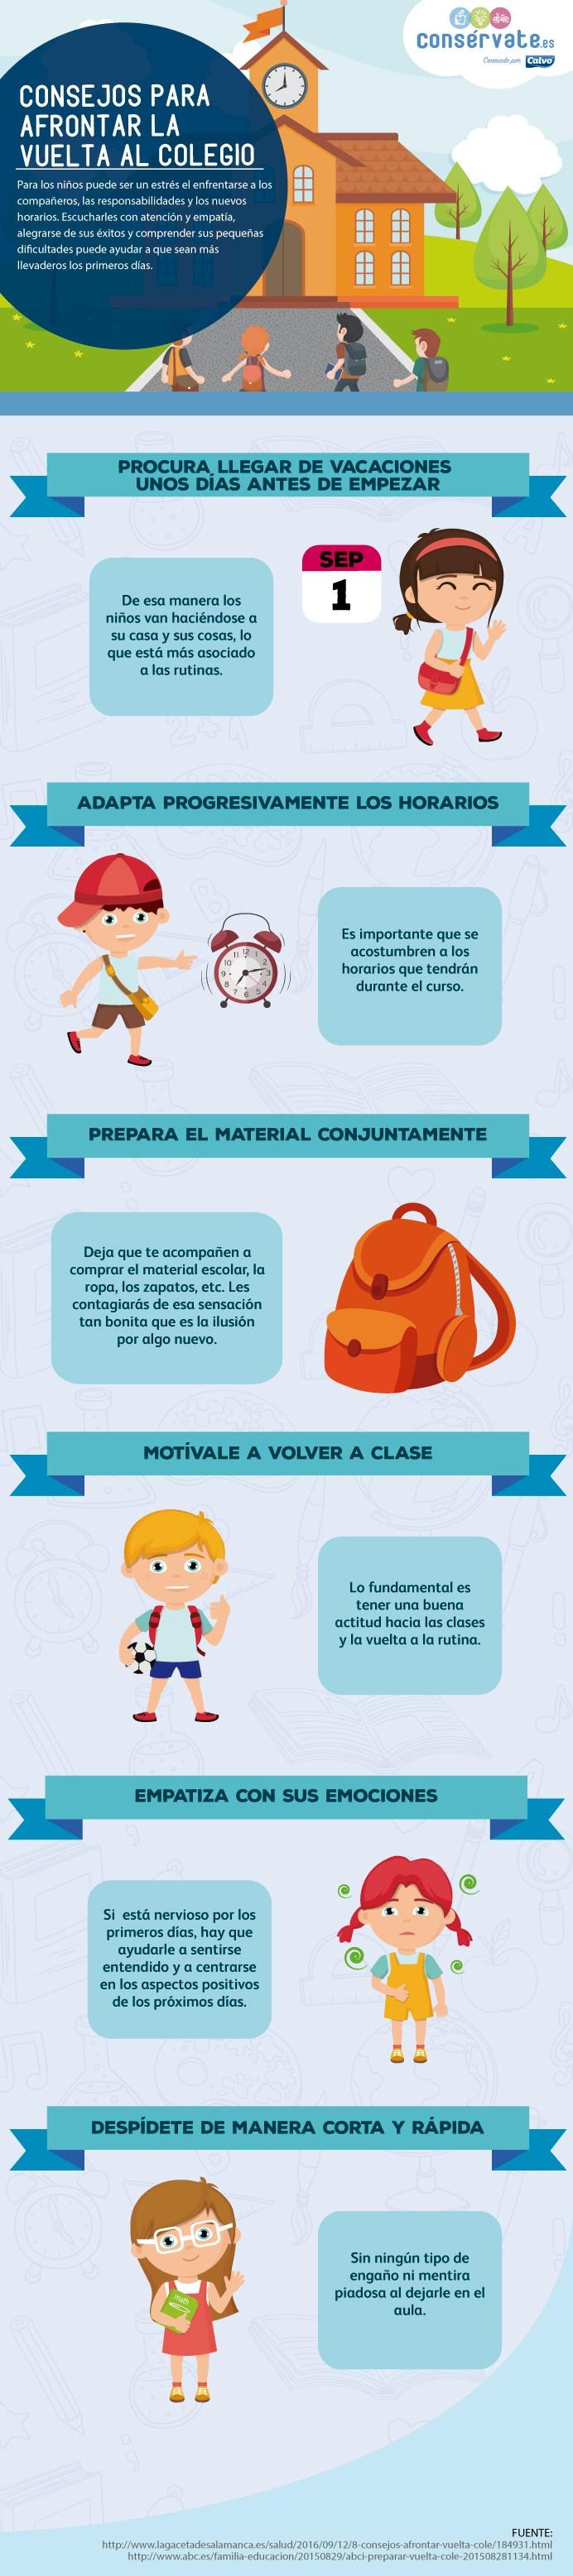 "Consejos para afrontar la ""vuelta al cole"" #infografia #infographic #education"